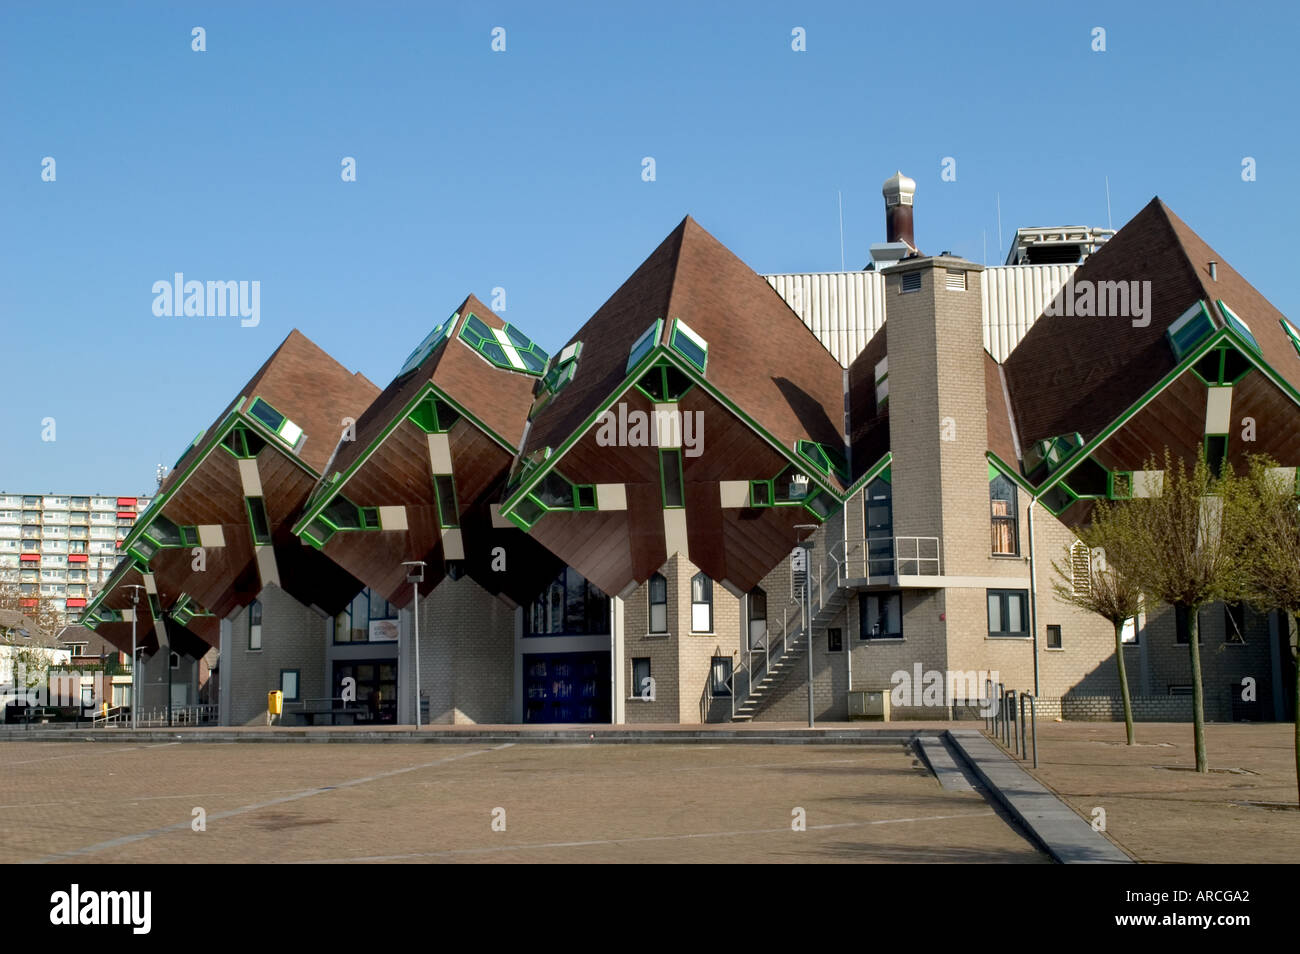 Helmond Architecture Kubus Paalwoningen Piet Blom - Stock Image